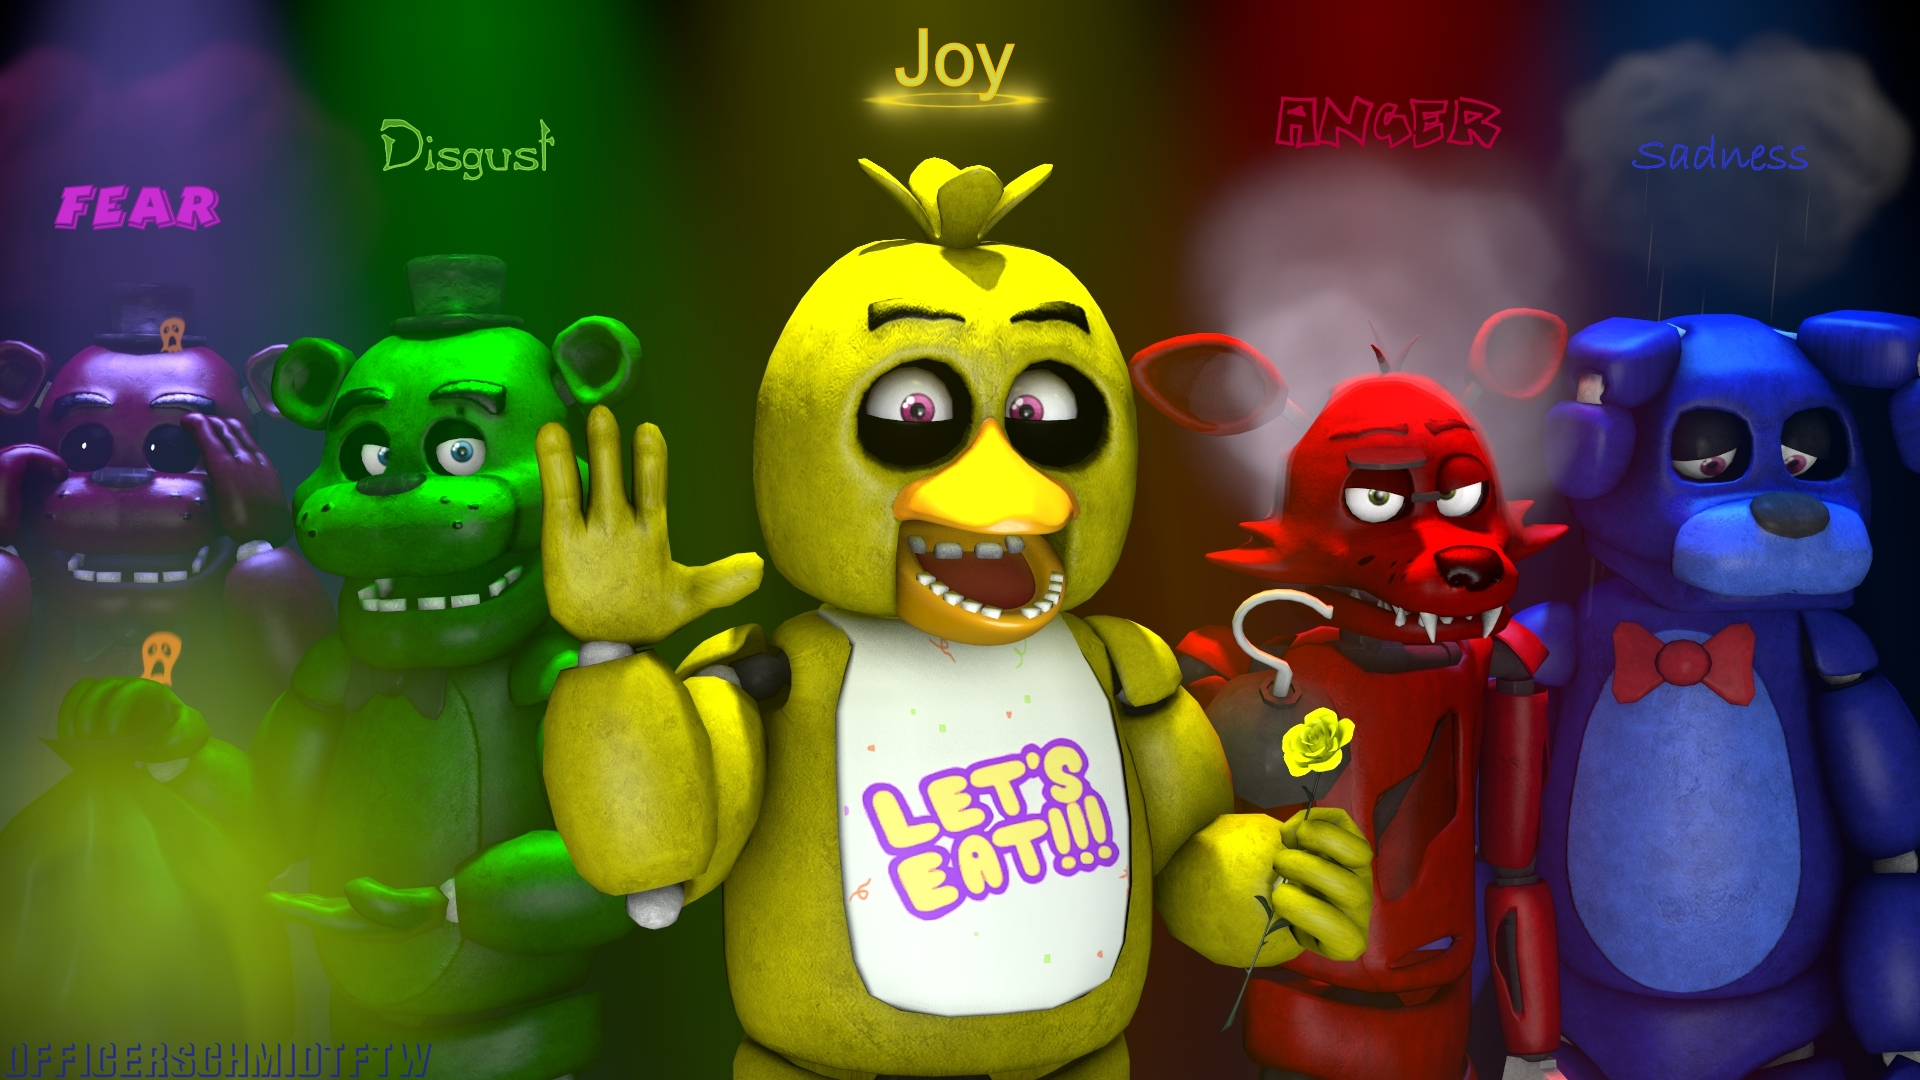 Smile Toys And Joys : Emotions sfm by officerschmidtftw on deviantart